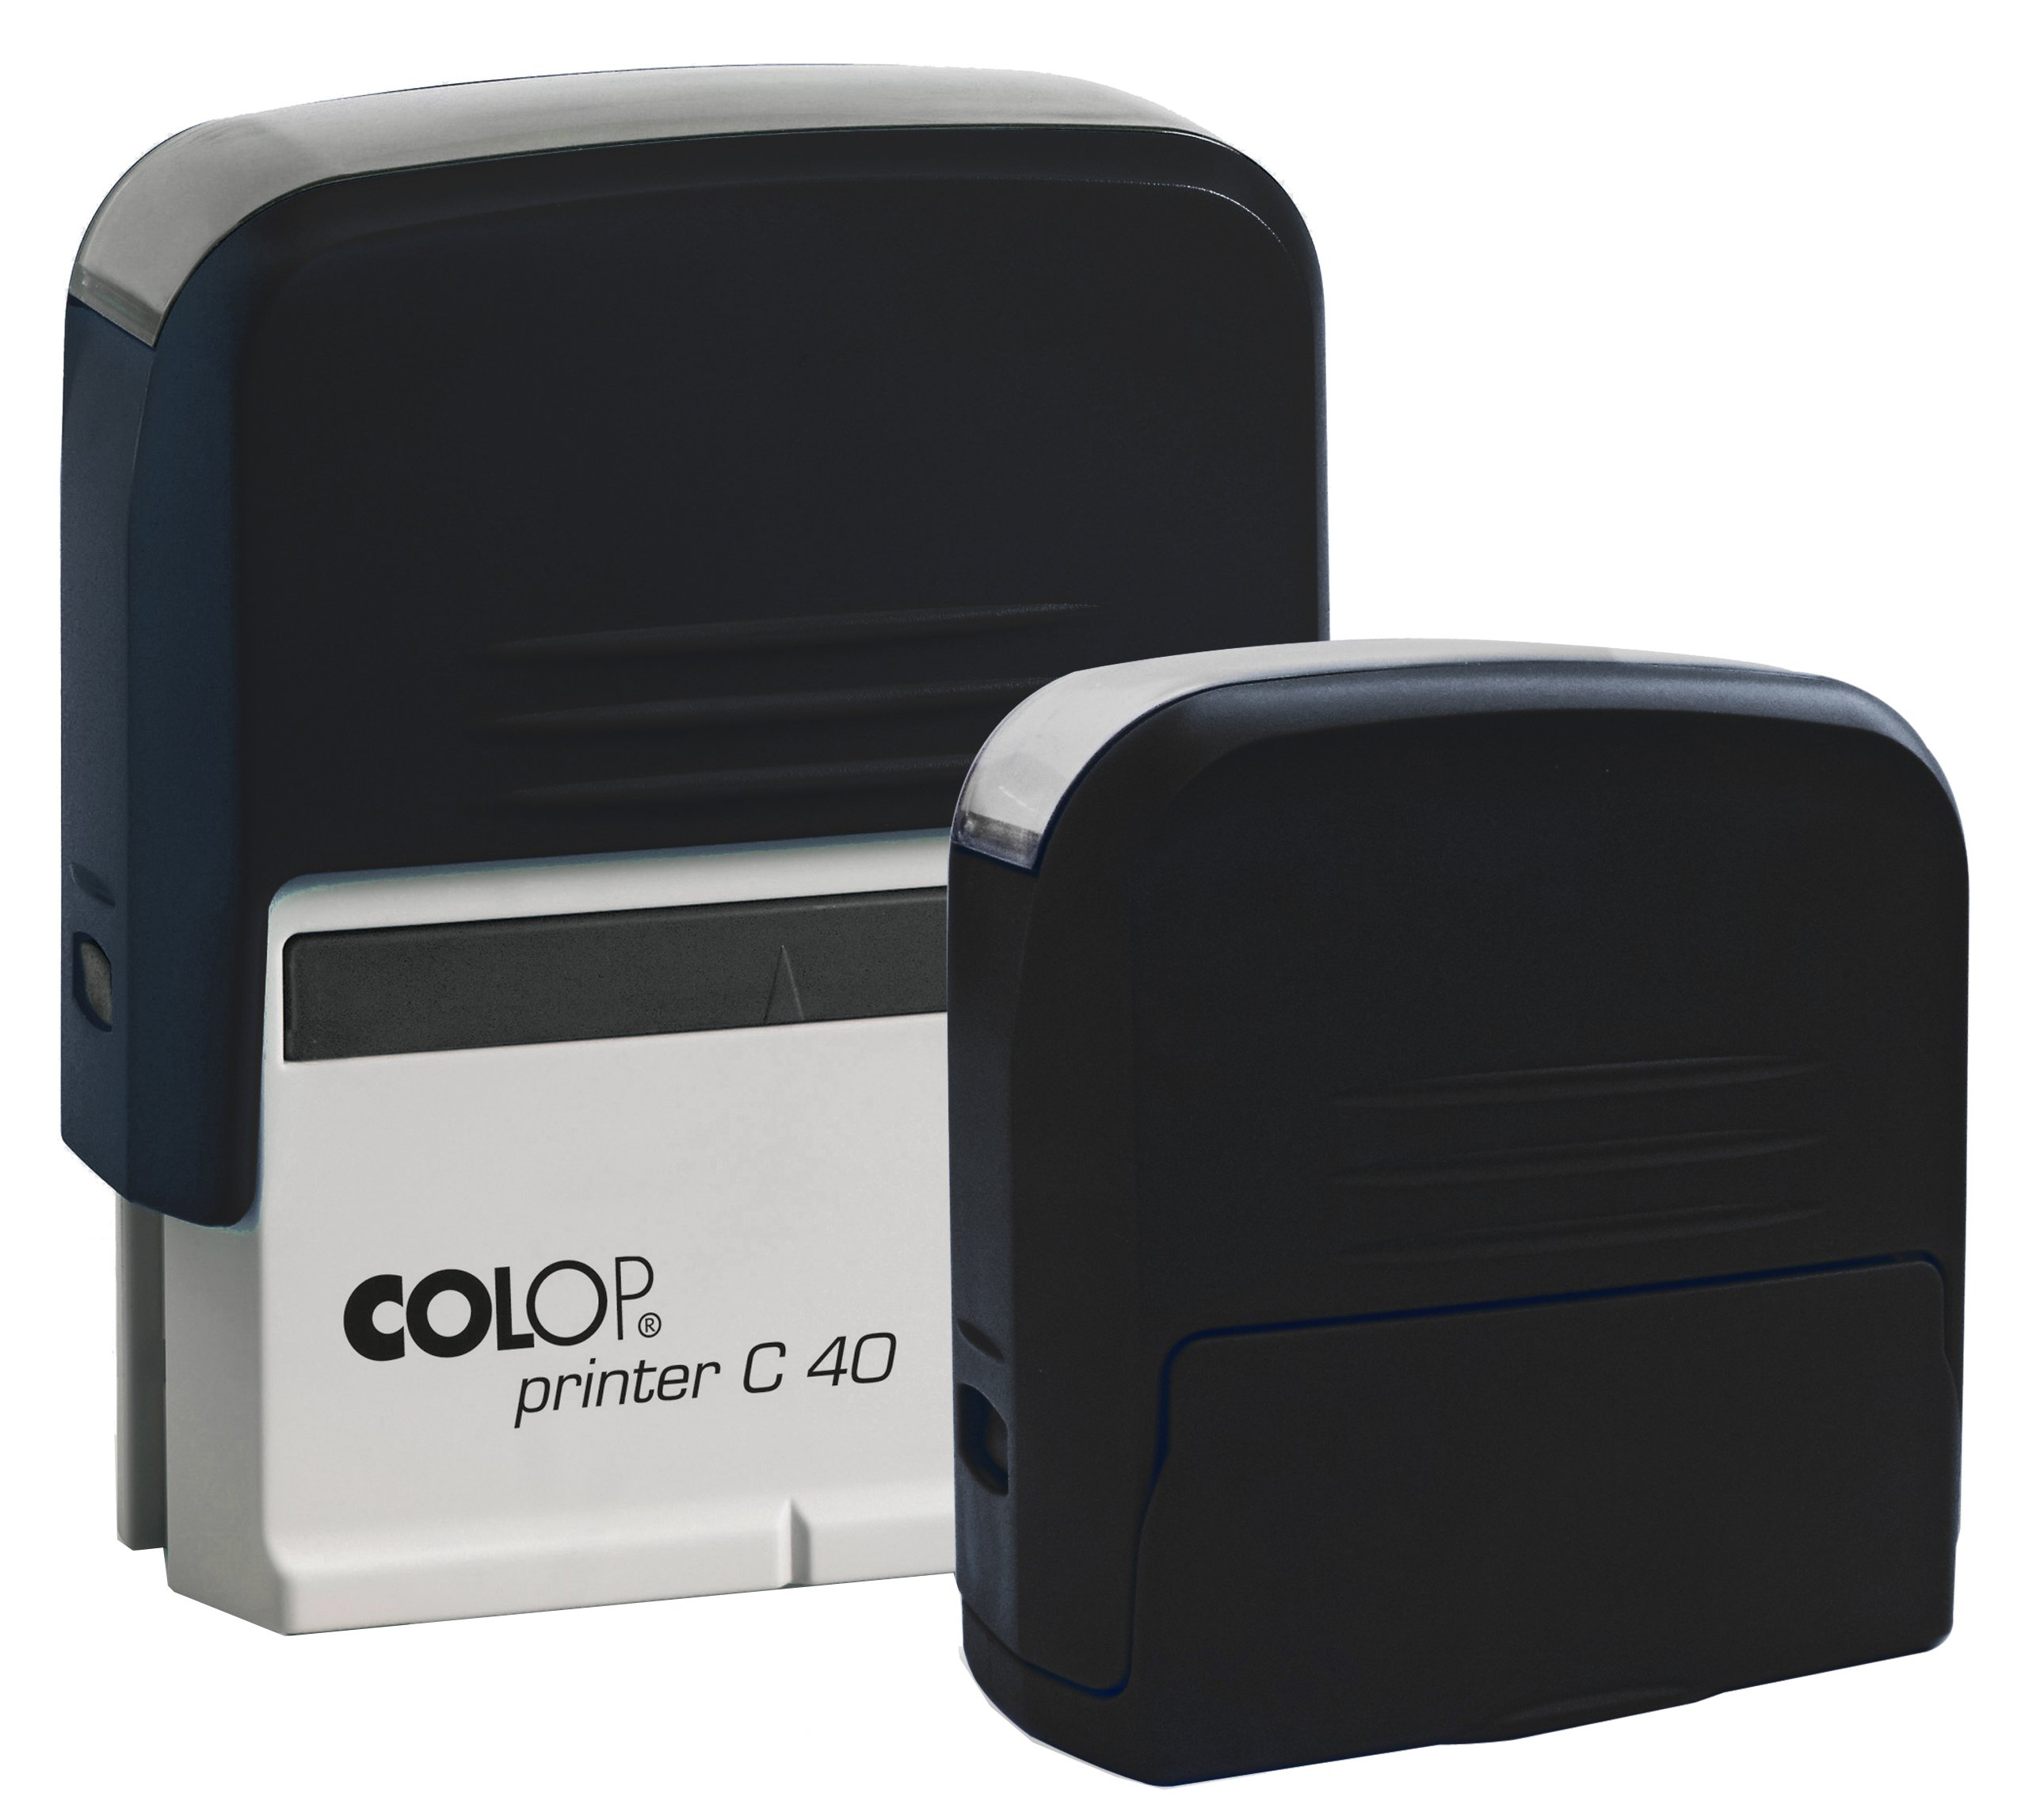 Item STAMP COLOP C40 company 7-8 lines + DESIGN